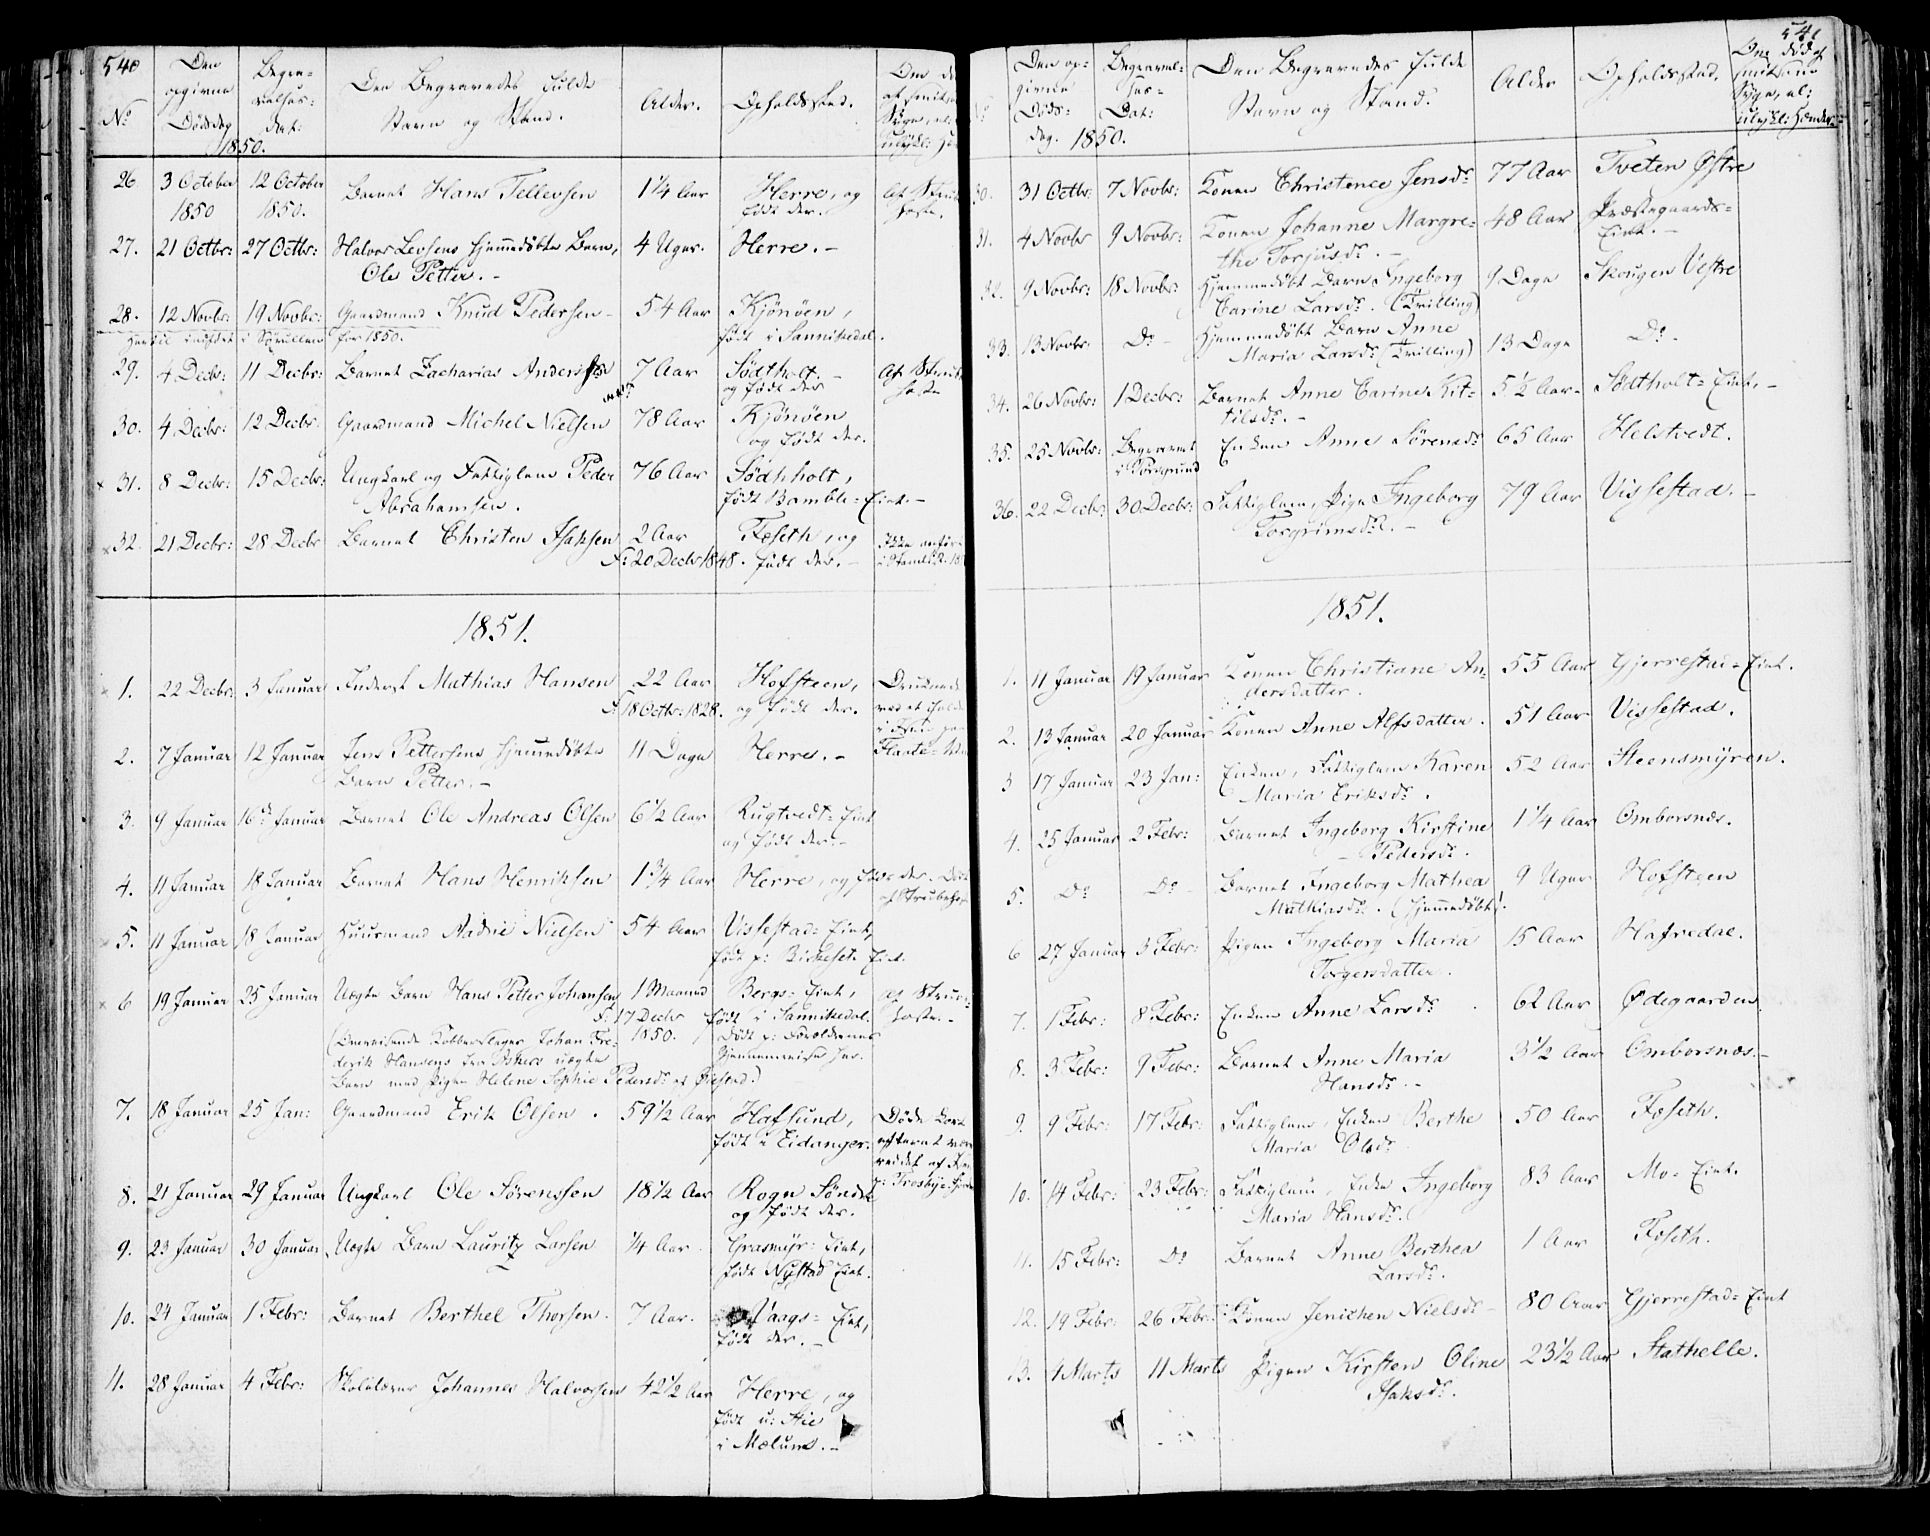 SAKO, Bamble kirkebøker, F/Fa/L0004: Ministerialbok nr. I 4, 1834-1853, s. 540-541